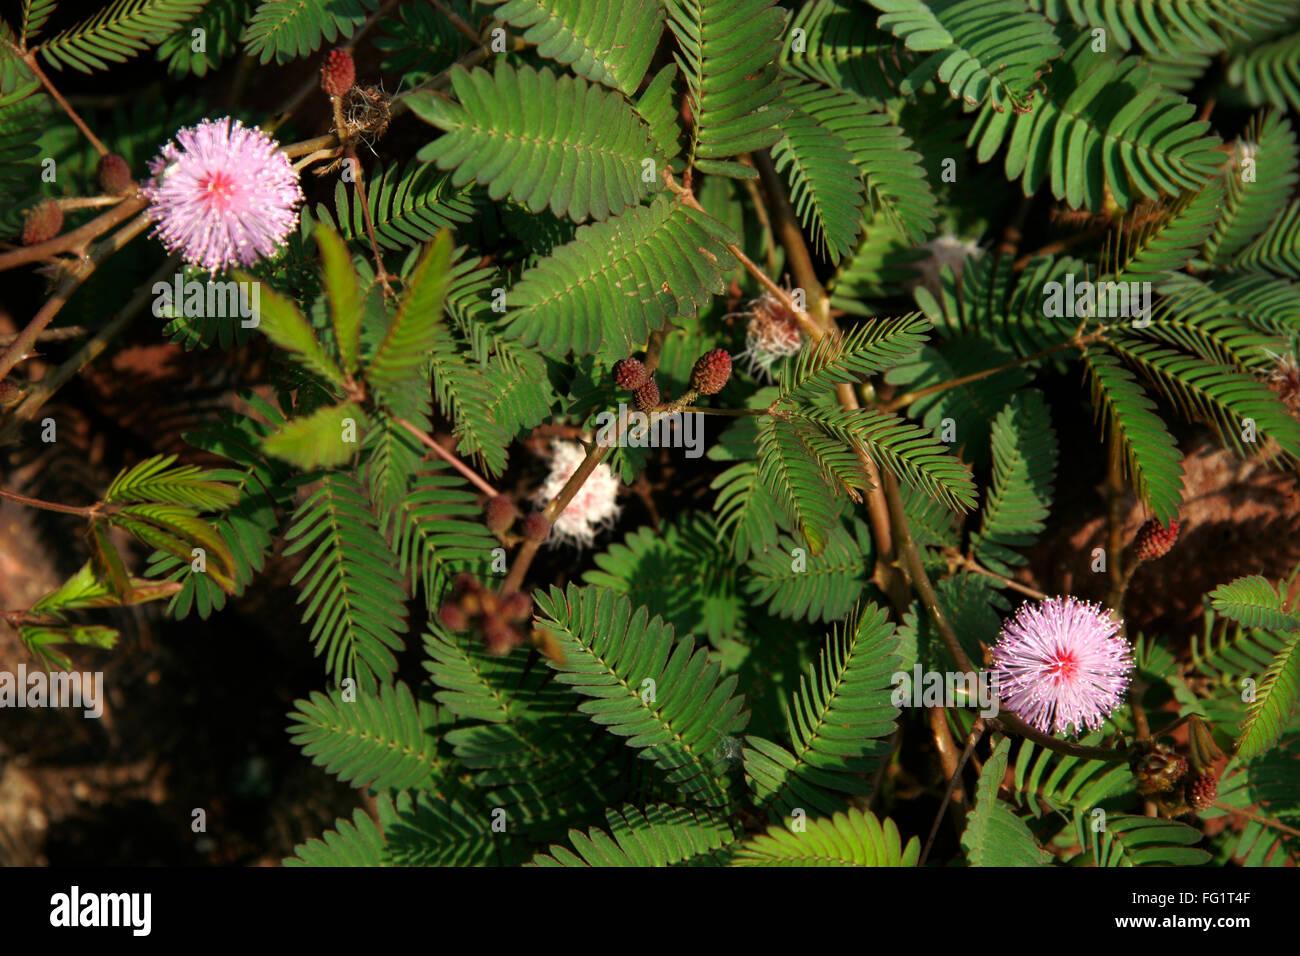 Ayurvedic Medicinal Plant Scientific Name Stock Photos Ayurvedic